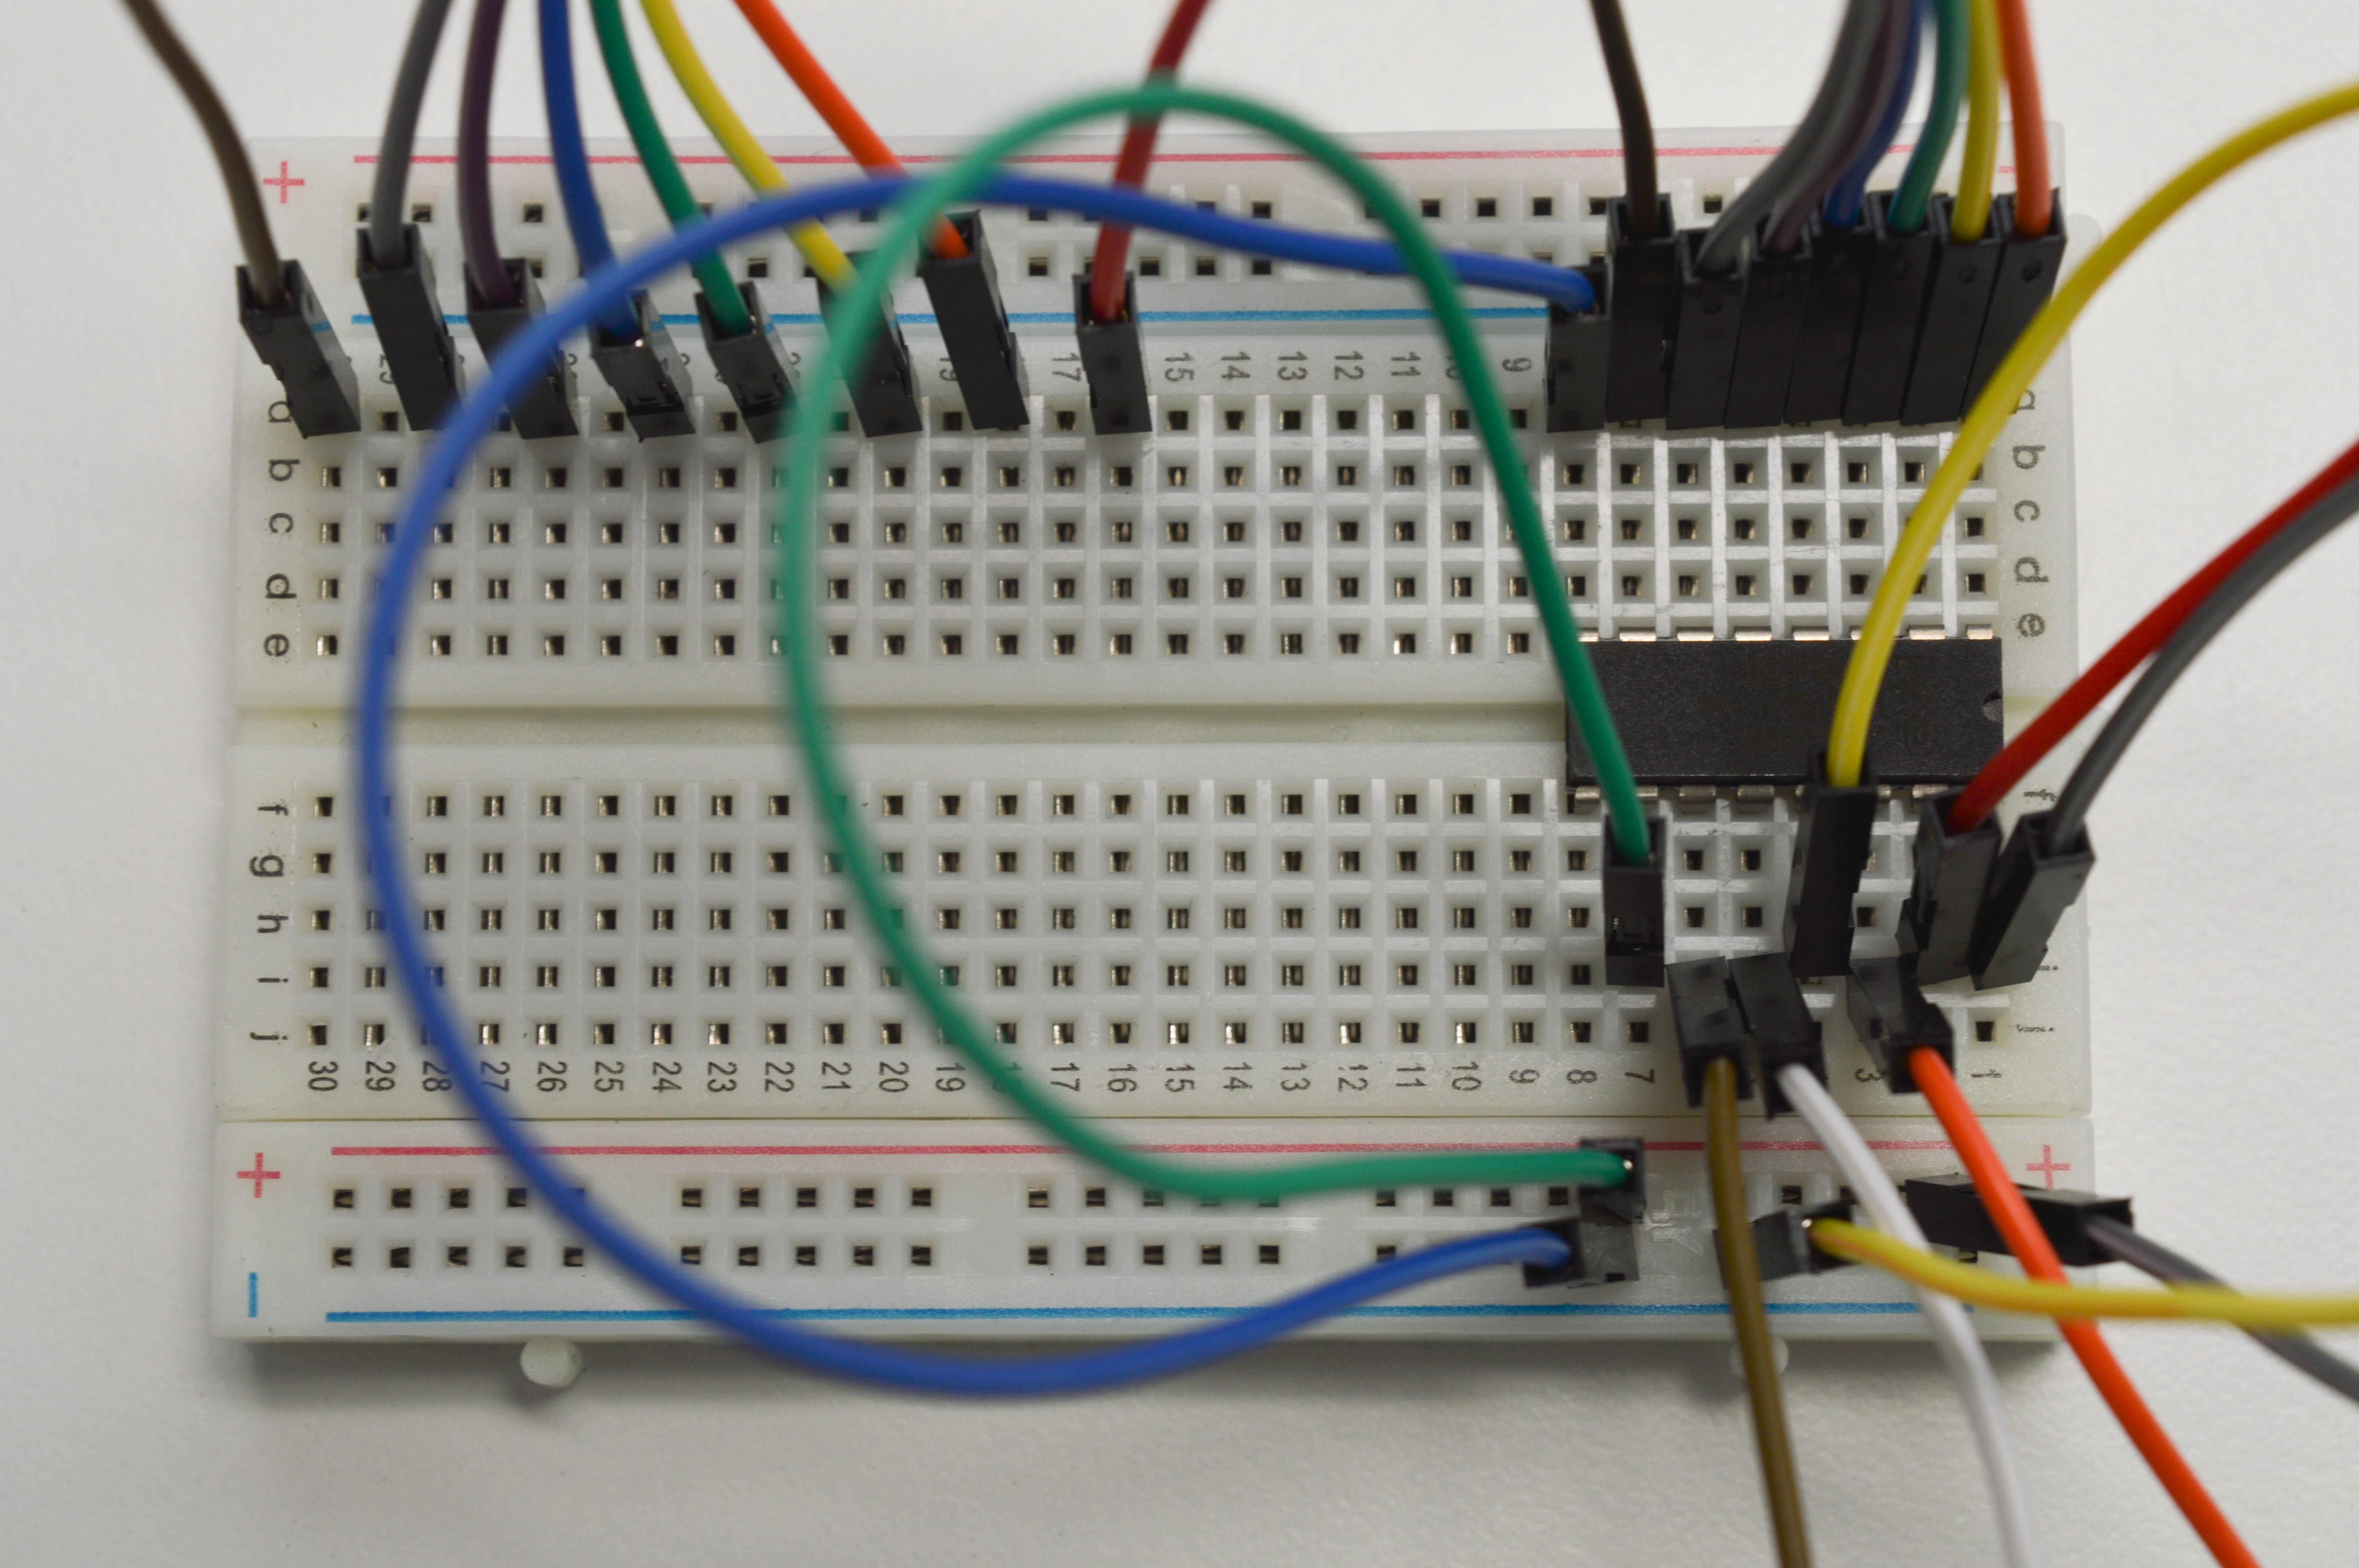 Shift register wired